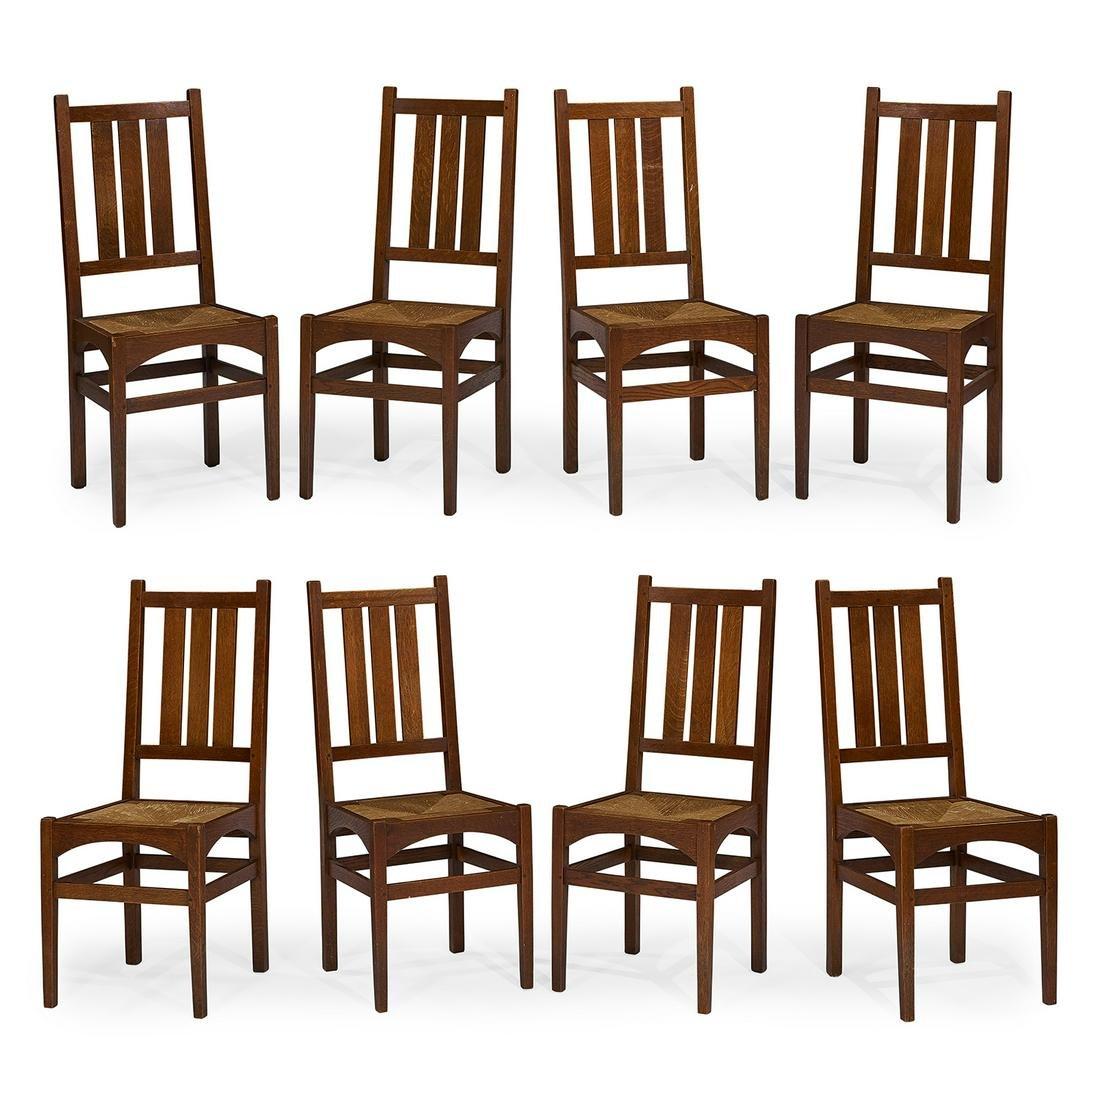 Gustav Stickley / Harvey Ellis side chairs, eight